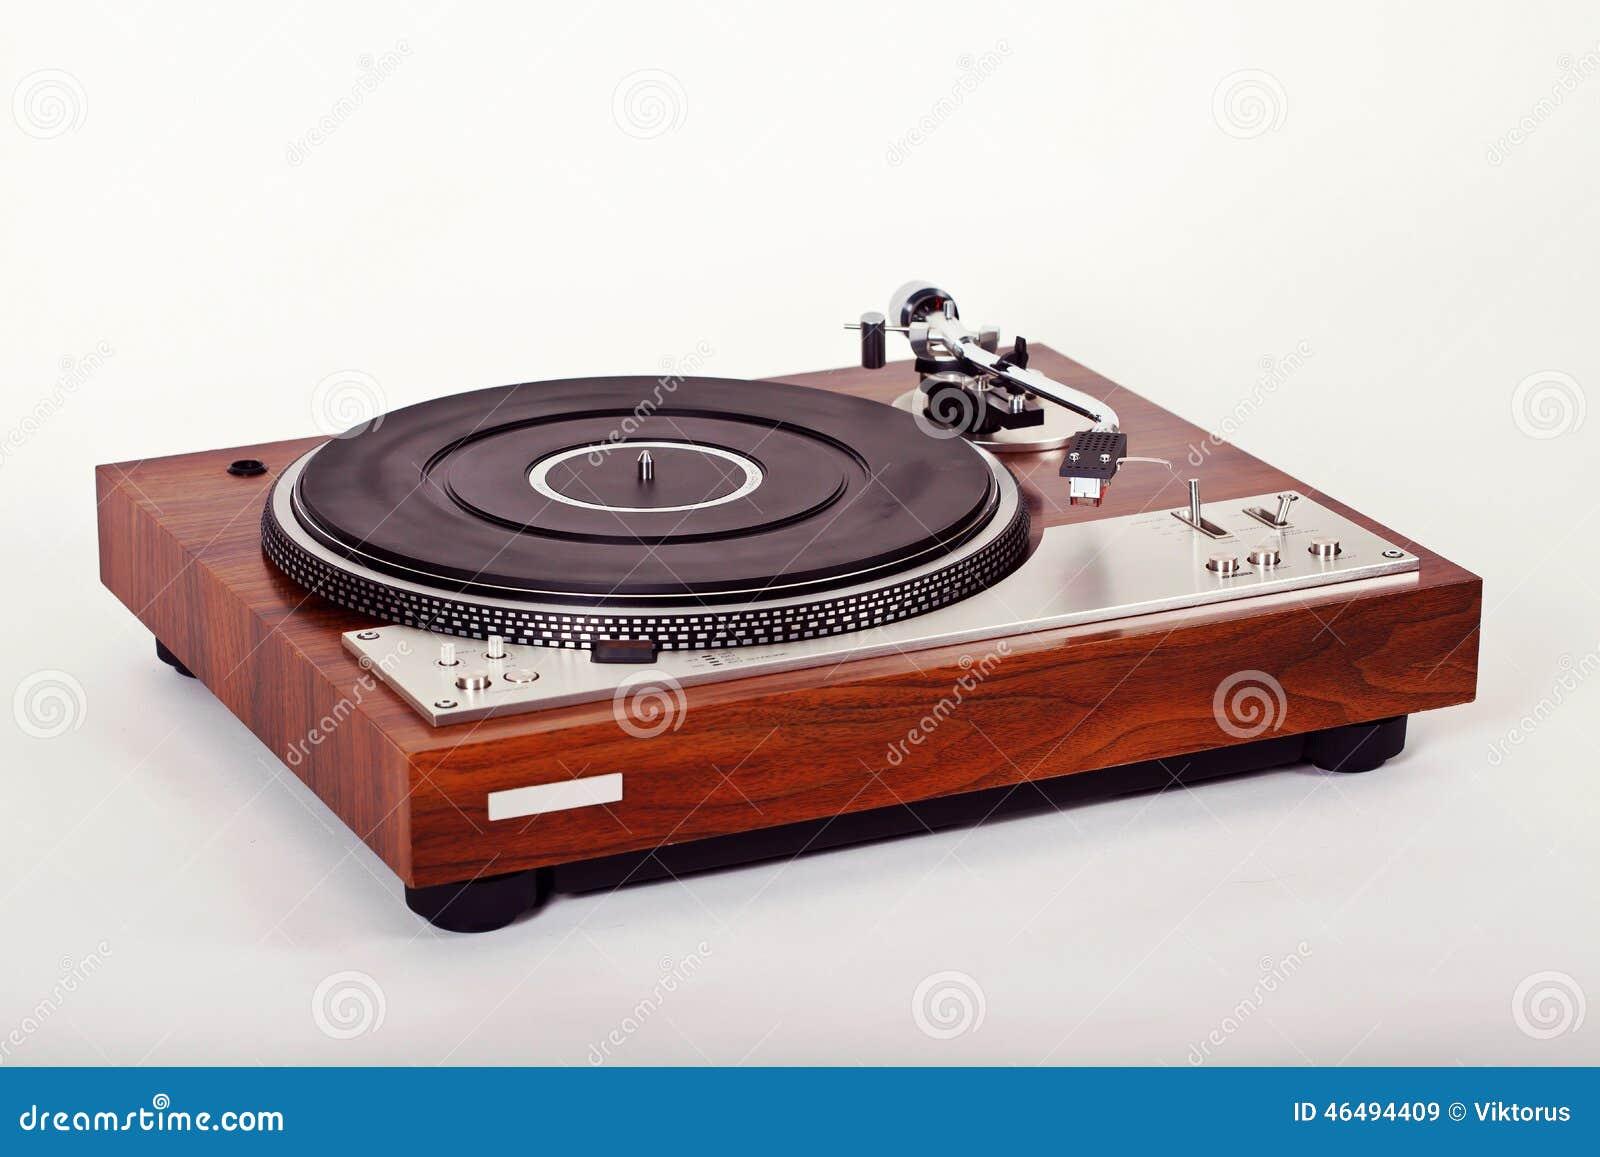 Analog Angle Player Record Retro Stereo Turntable ...